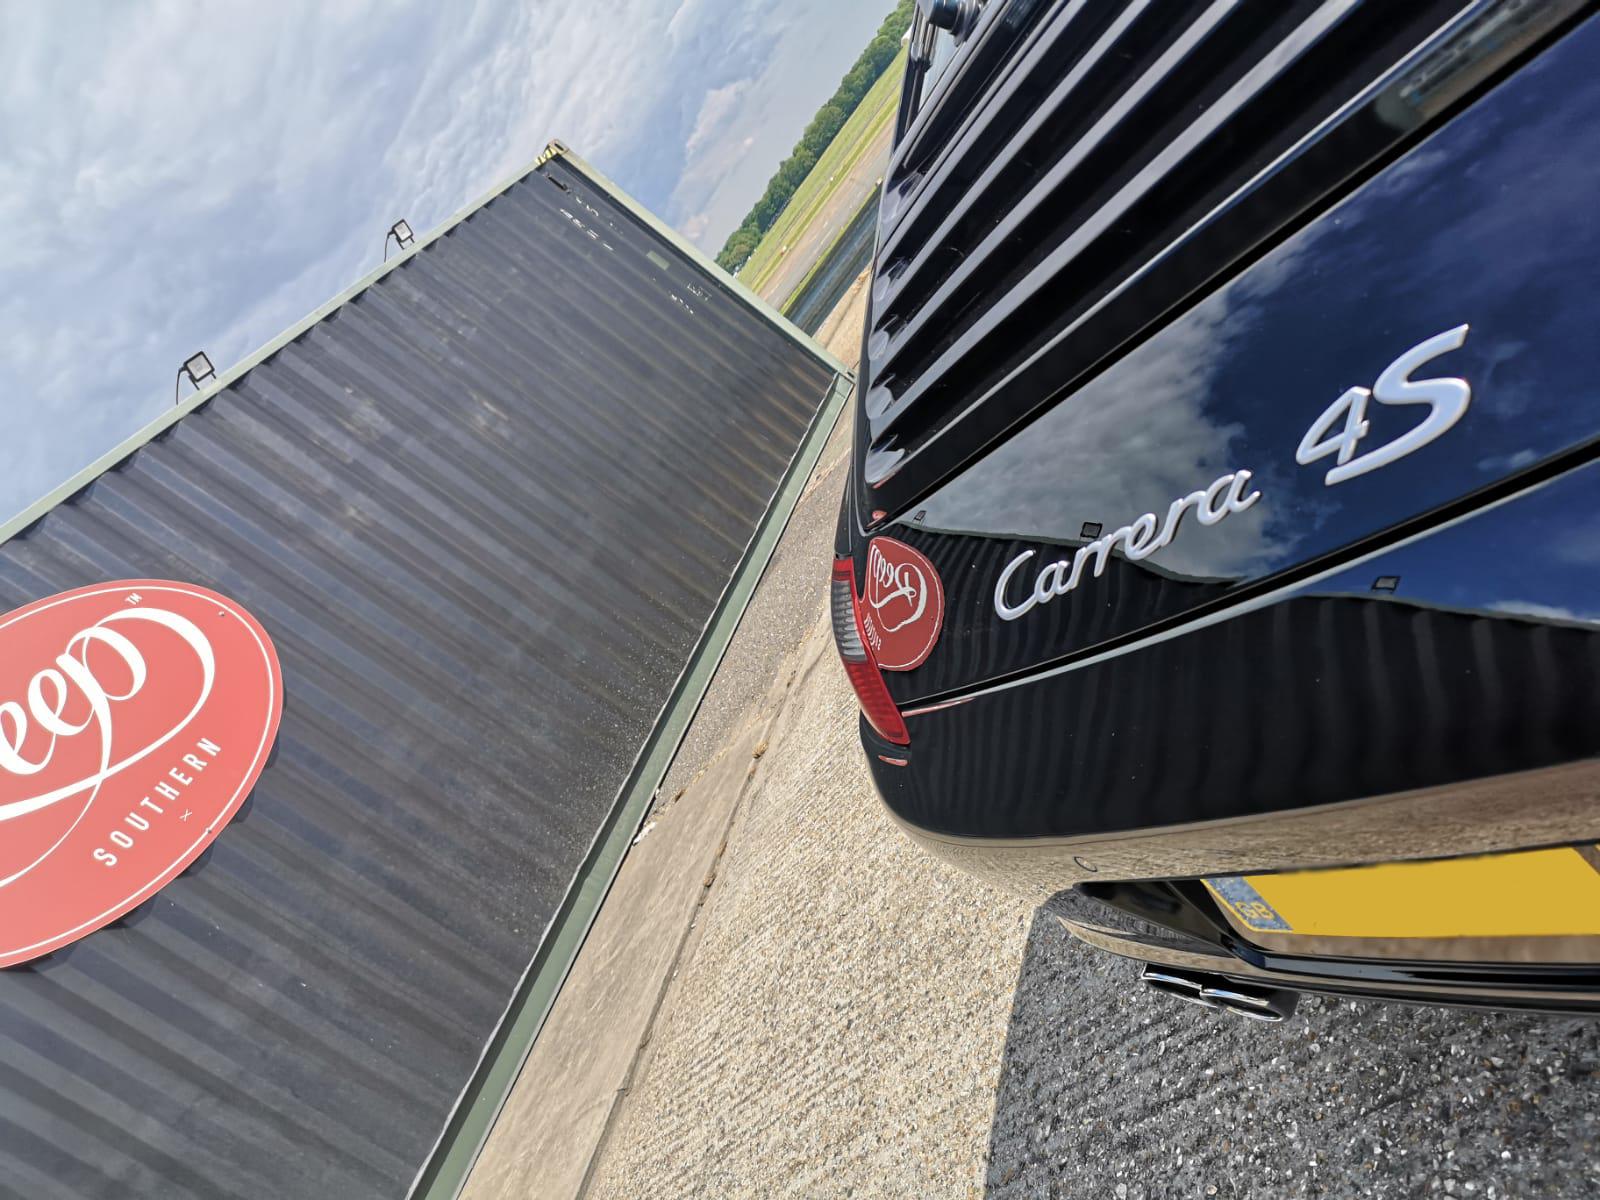 Porsche Carrera Detailing